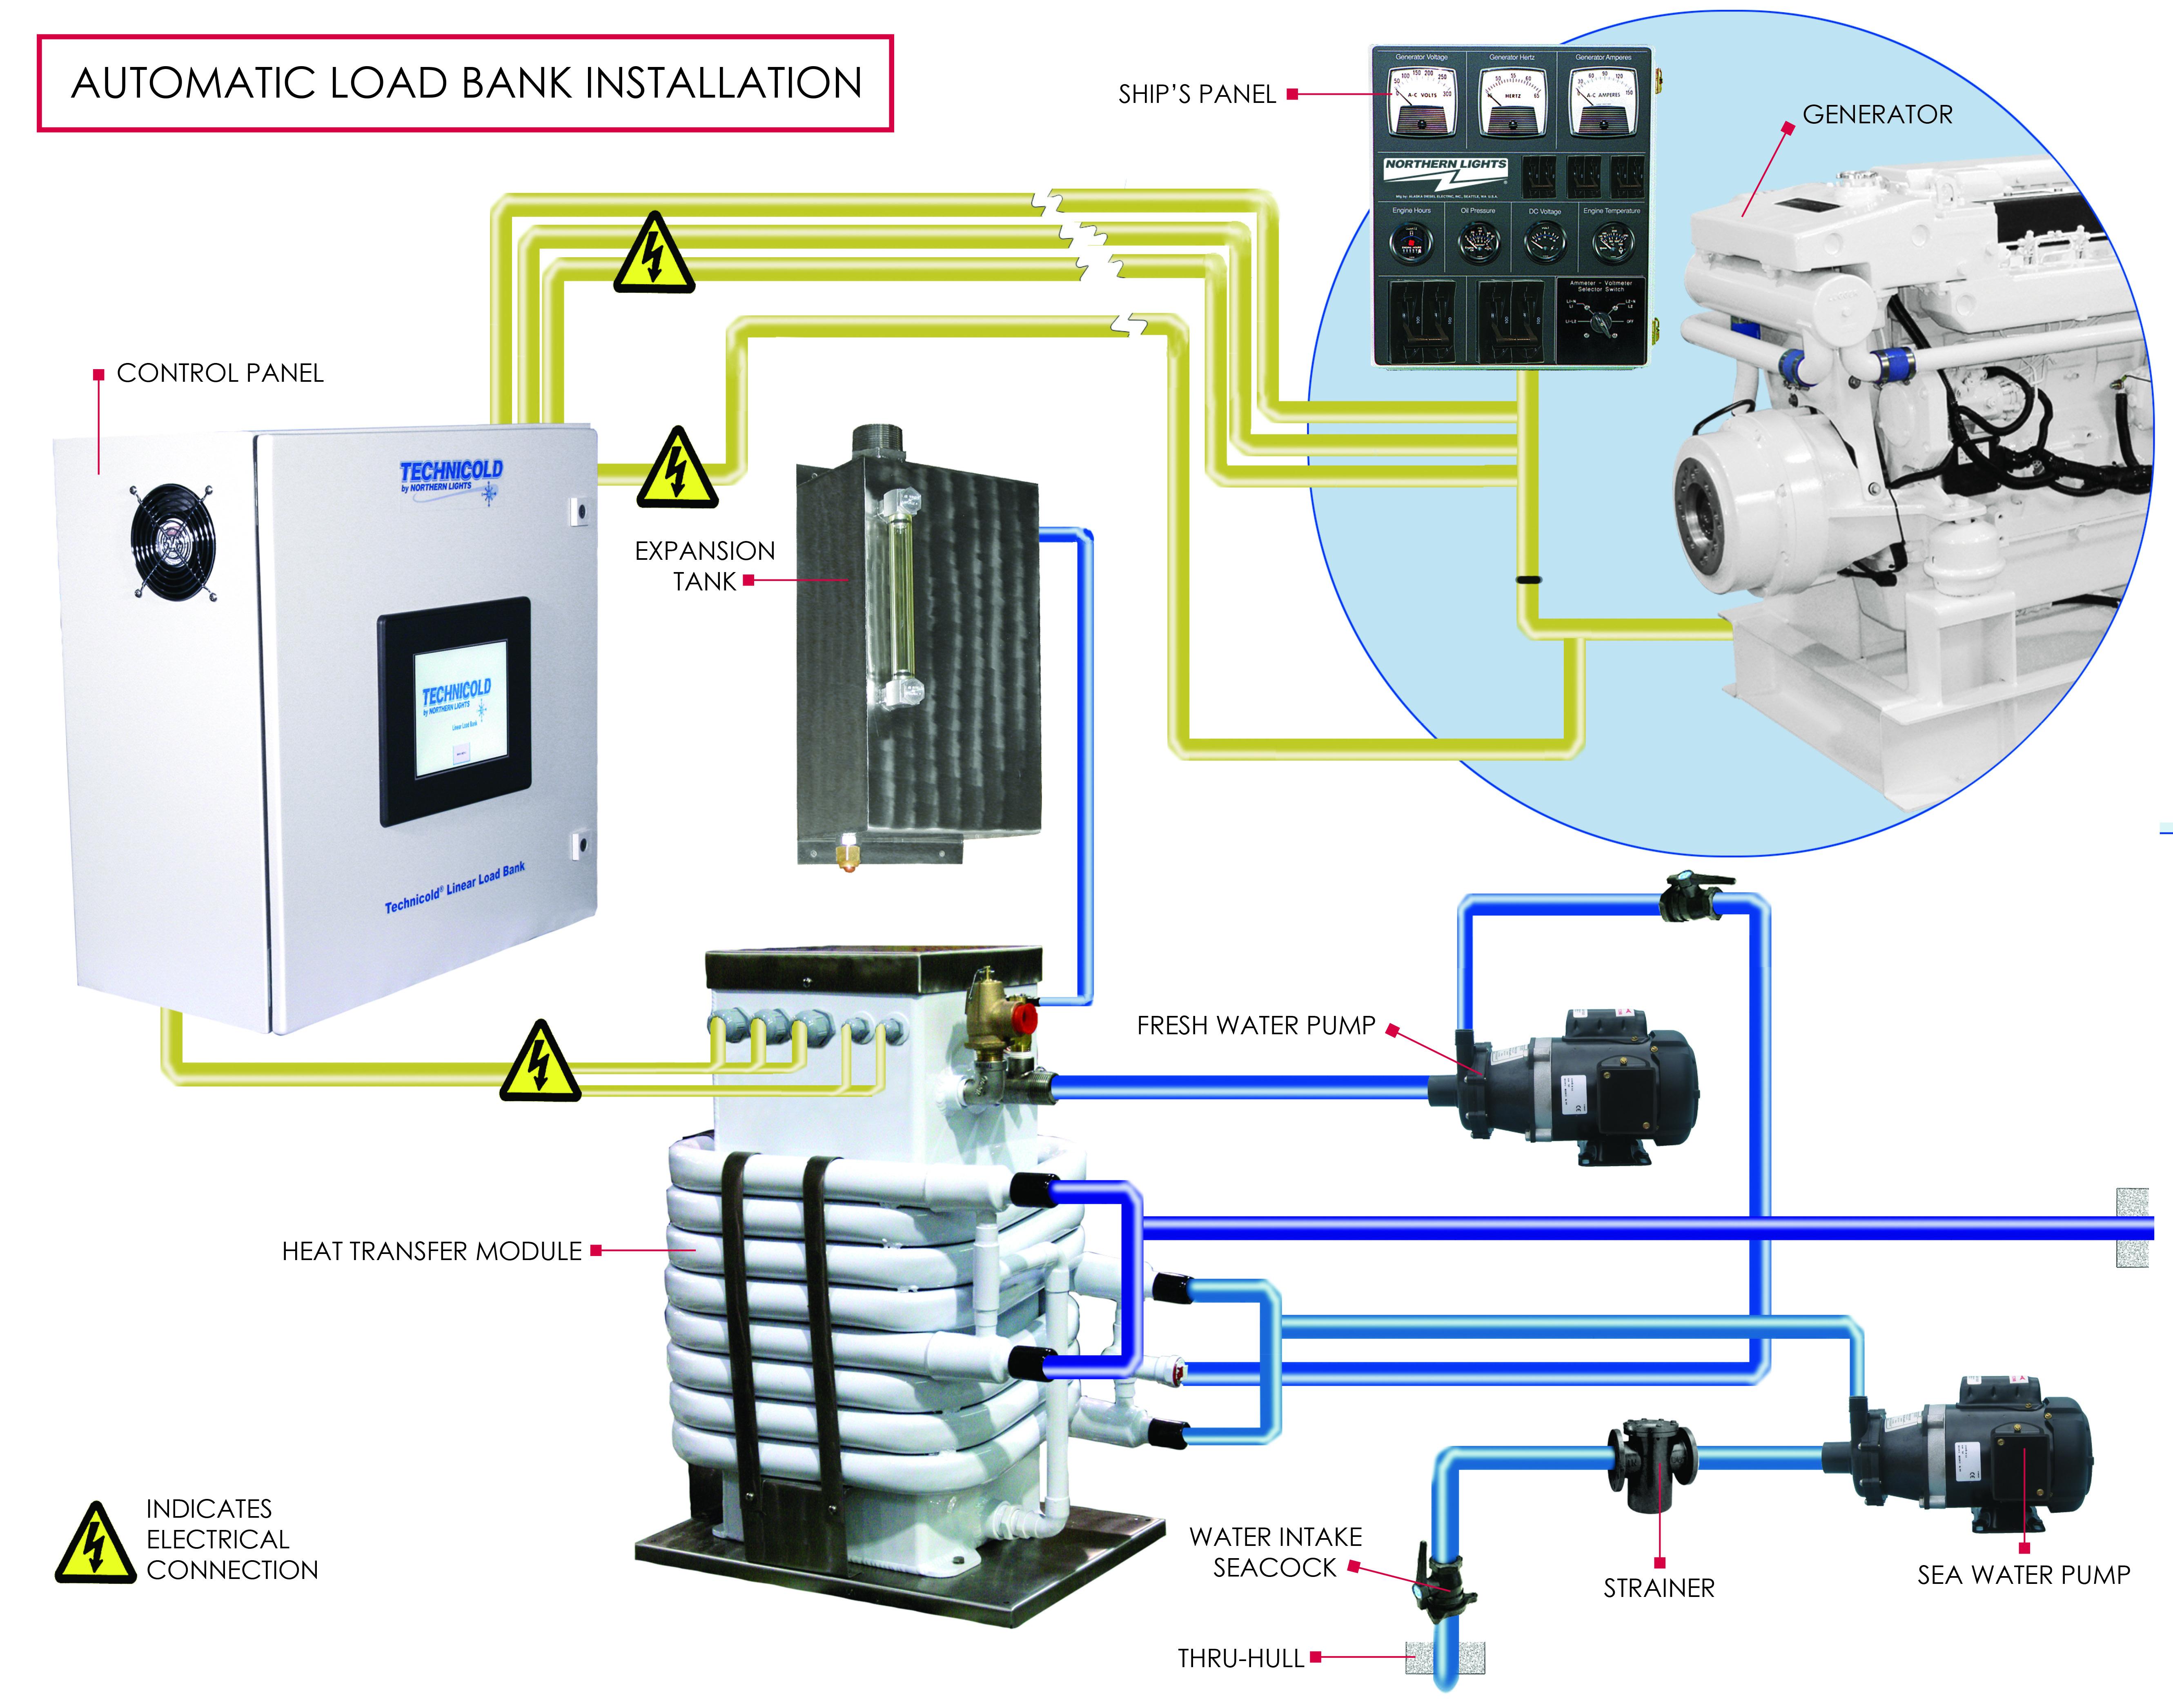 technicold technical information northern lights marine generators rh northern lights com